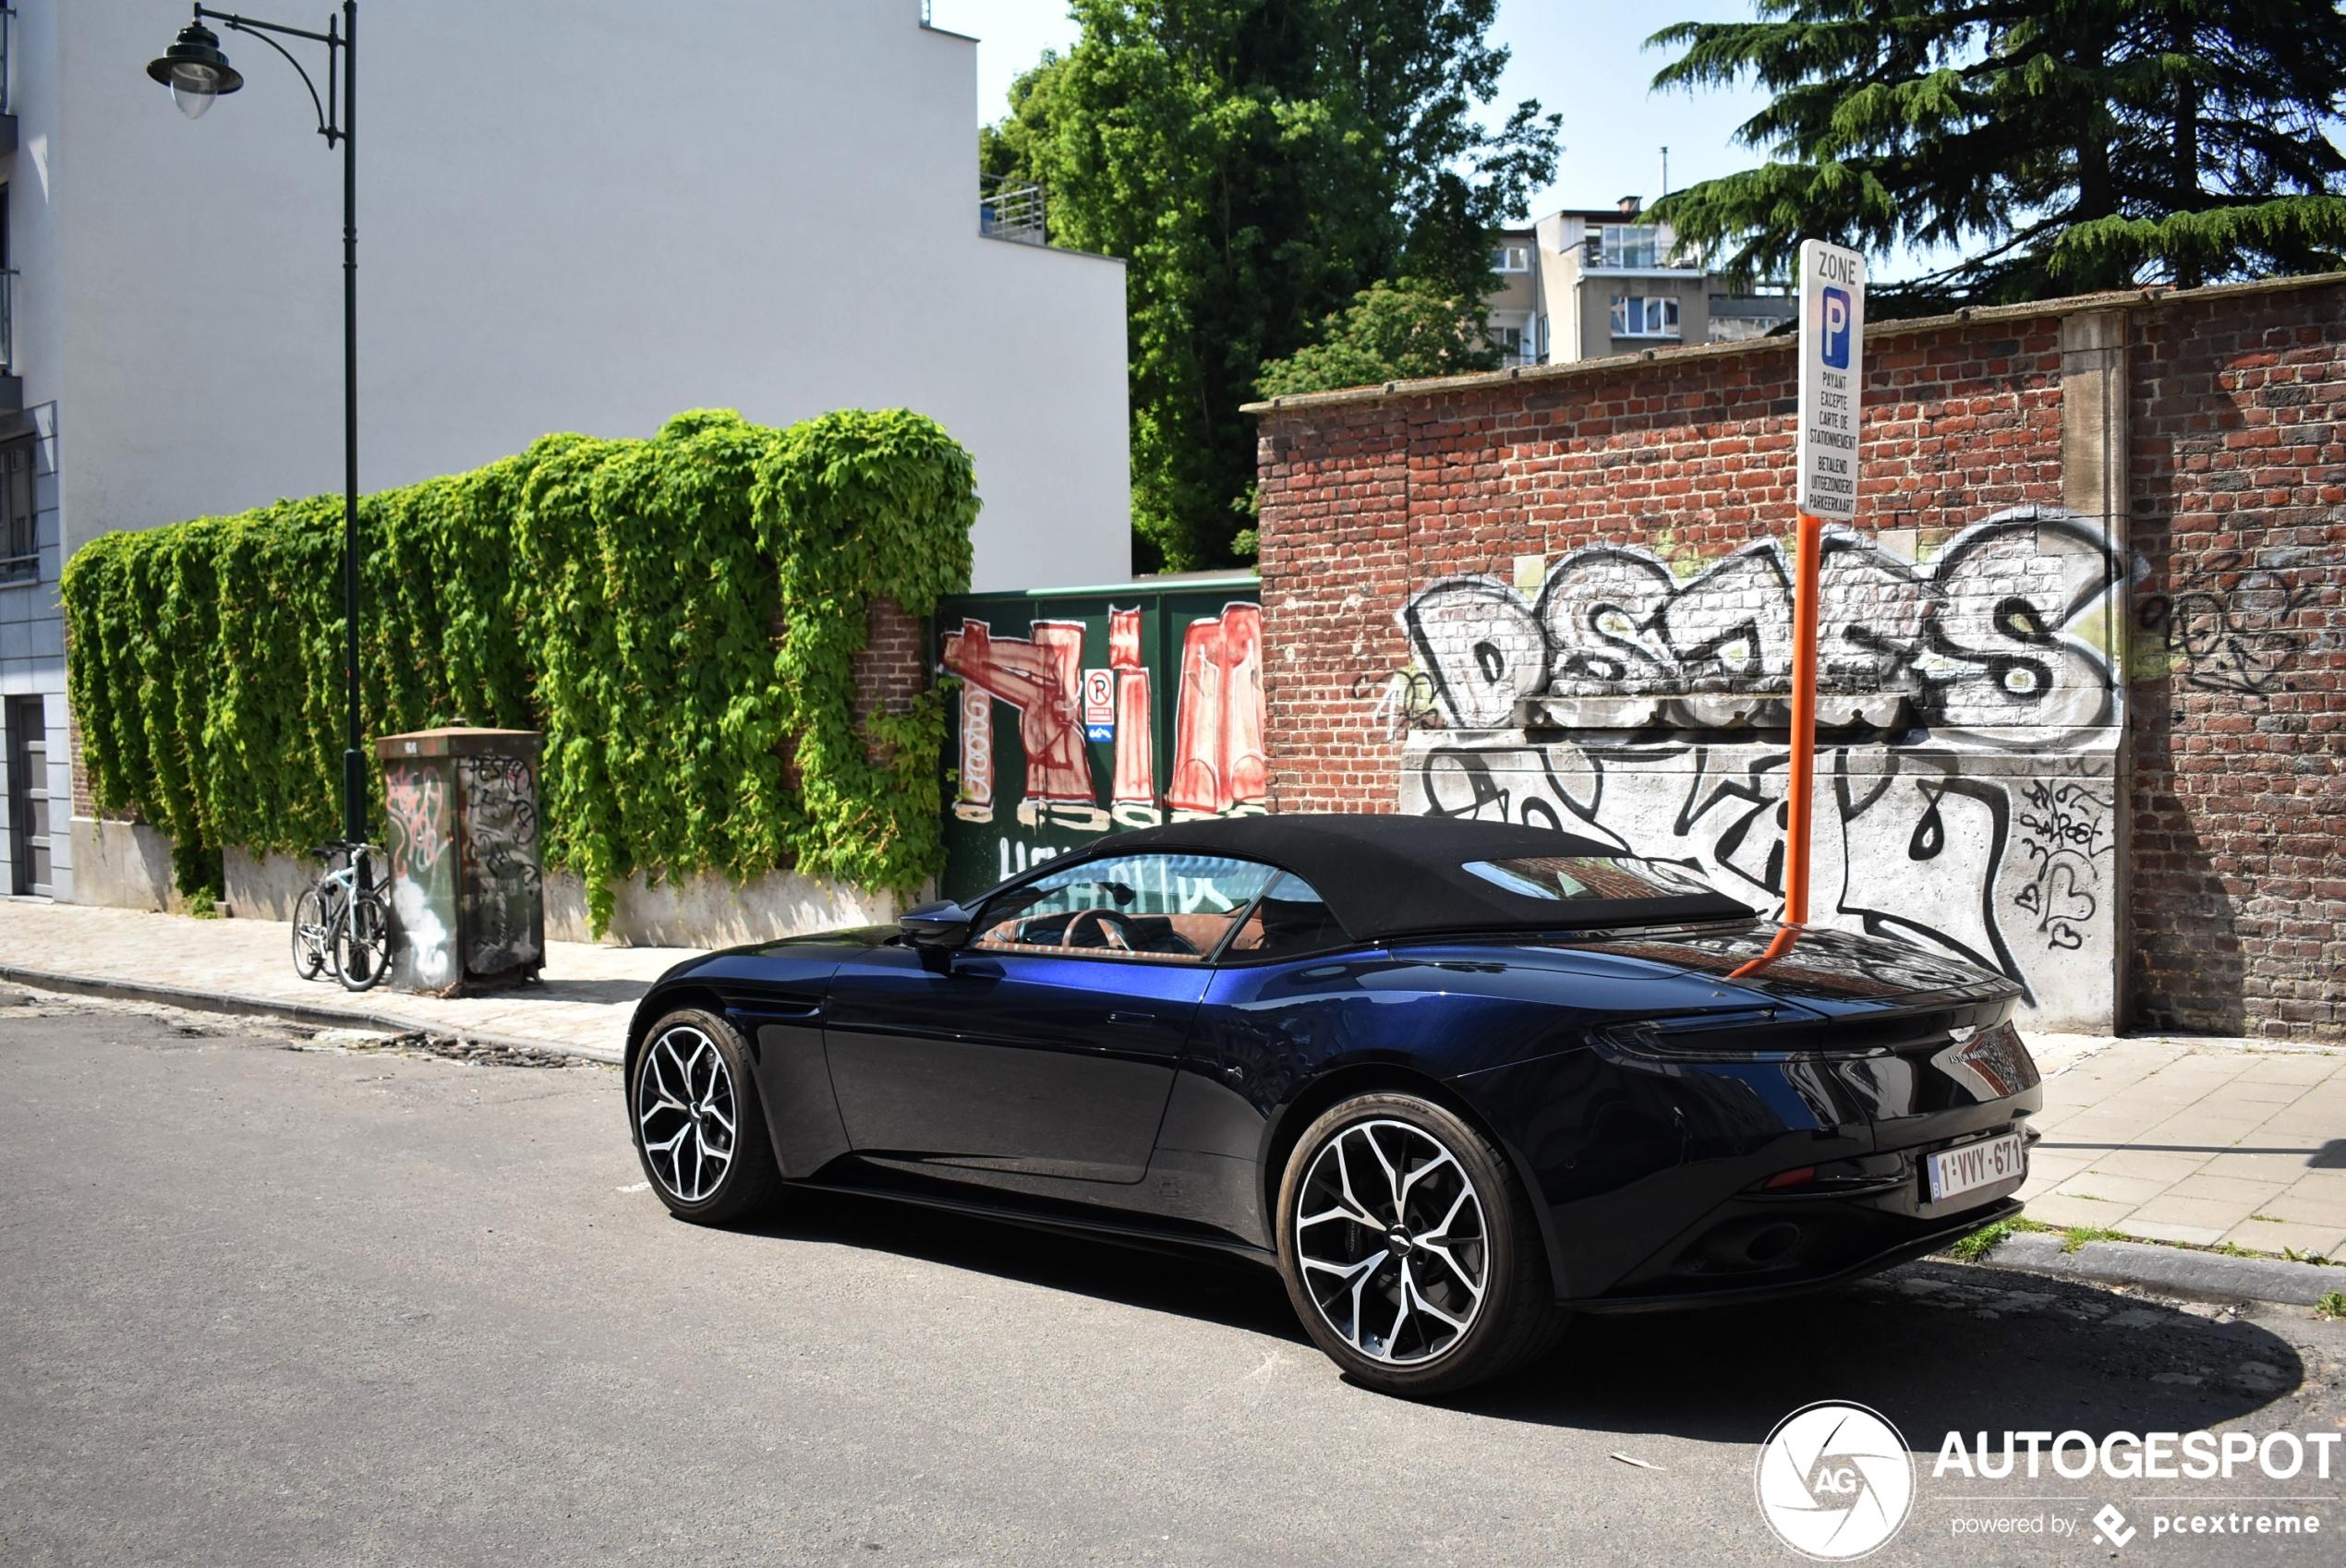 Aston Martin Db11 V8 Volante 9 May 2020 Autogespot